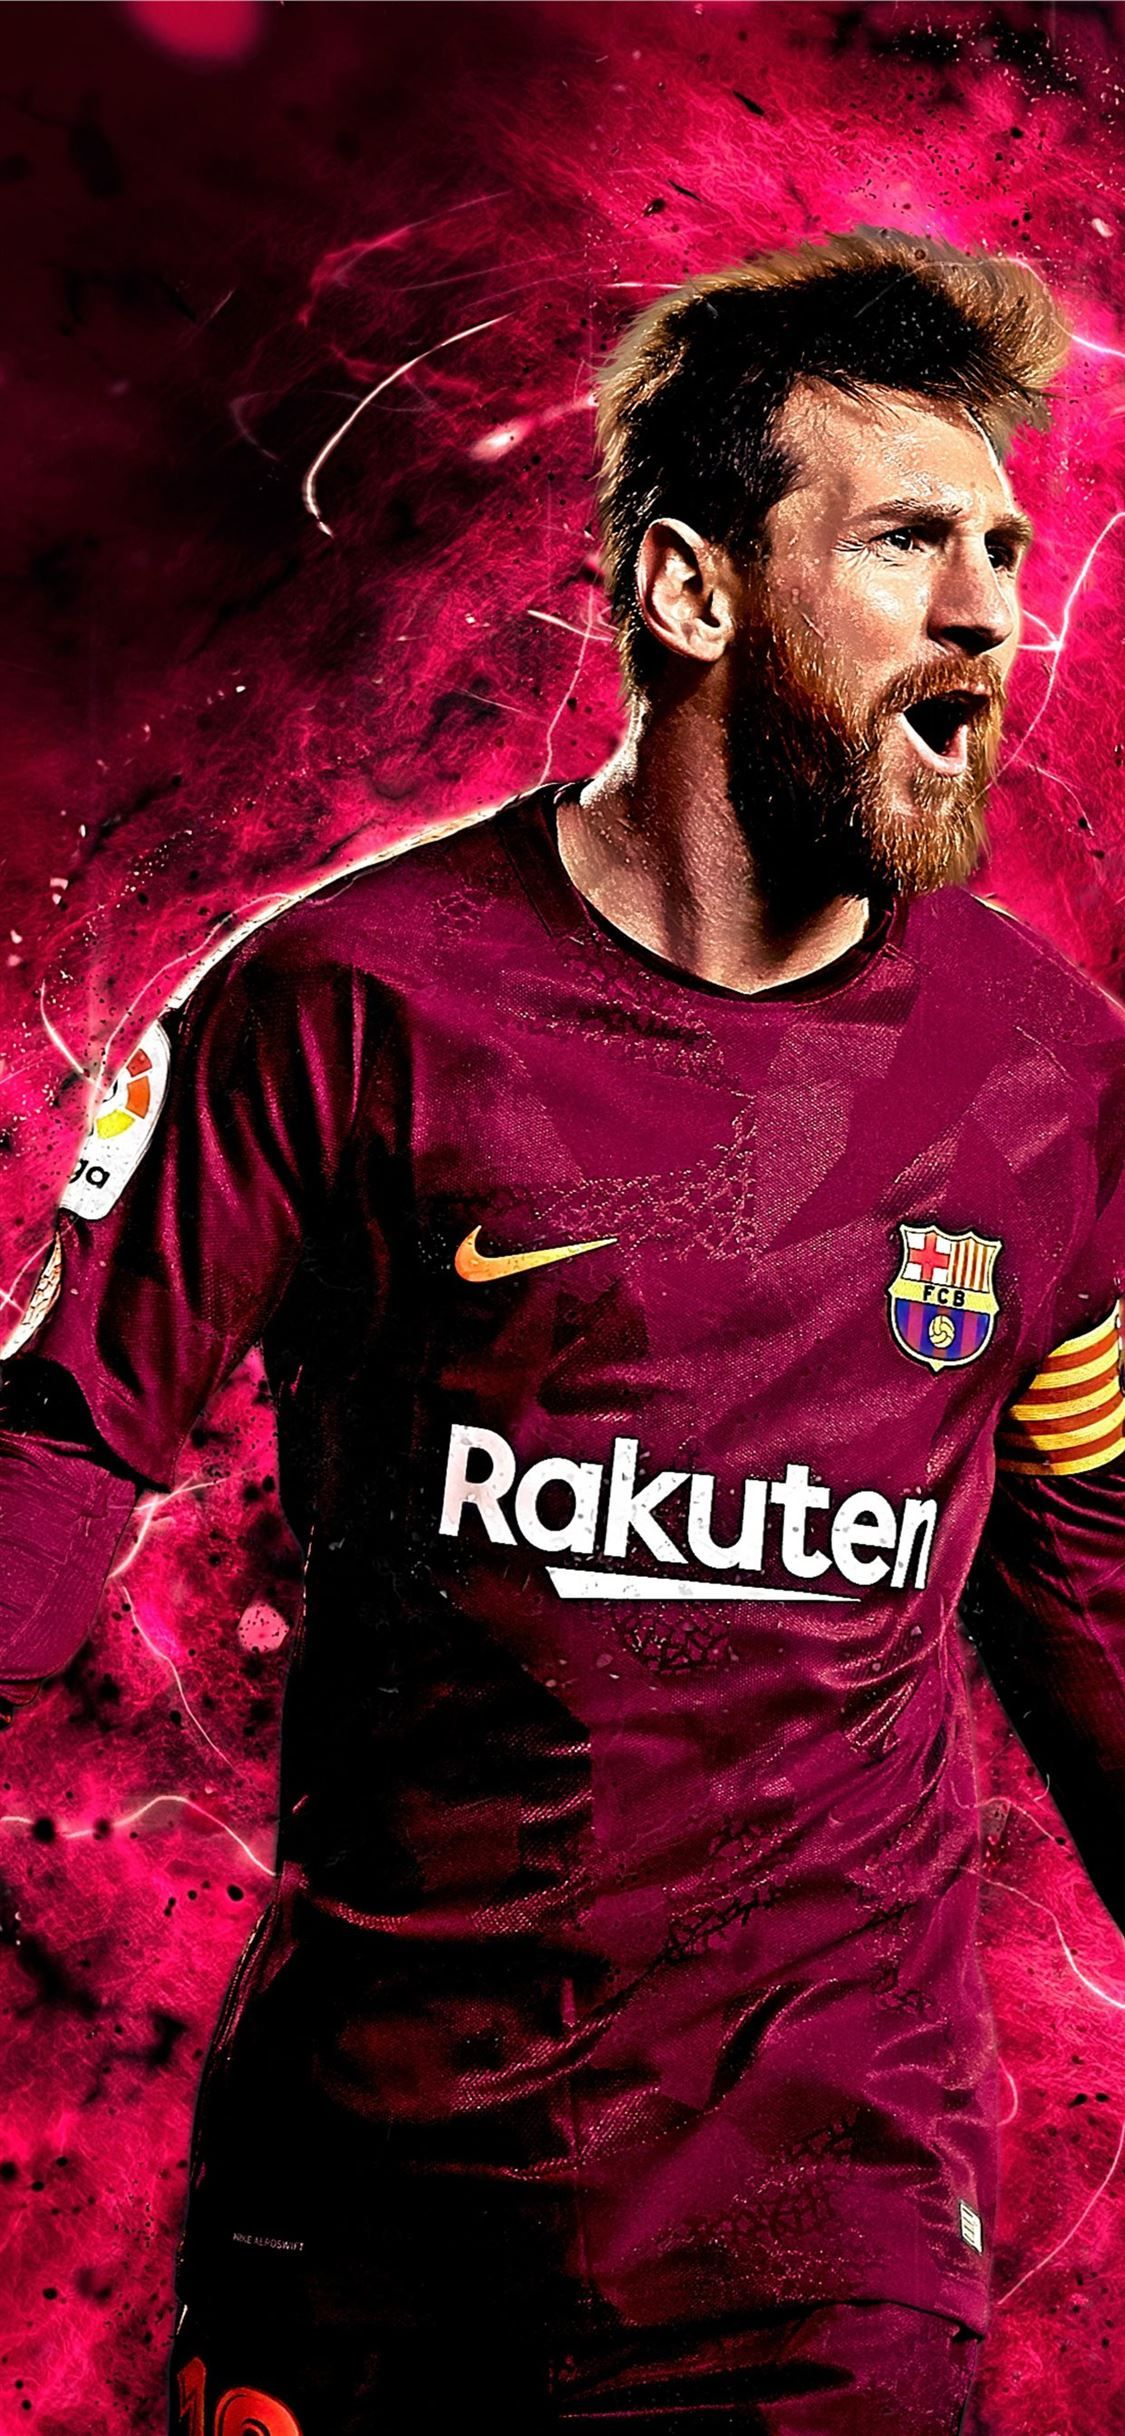 Pin On Lionelmessi Sportcelebrity Soccercelebrity Argentina Iphone11wallpaper Lionel Messi Wallpapers Lionel Messi Leonel Messi